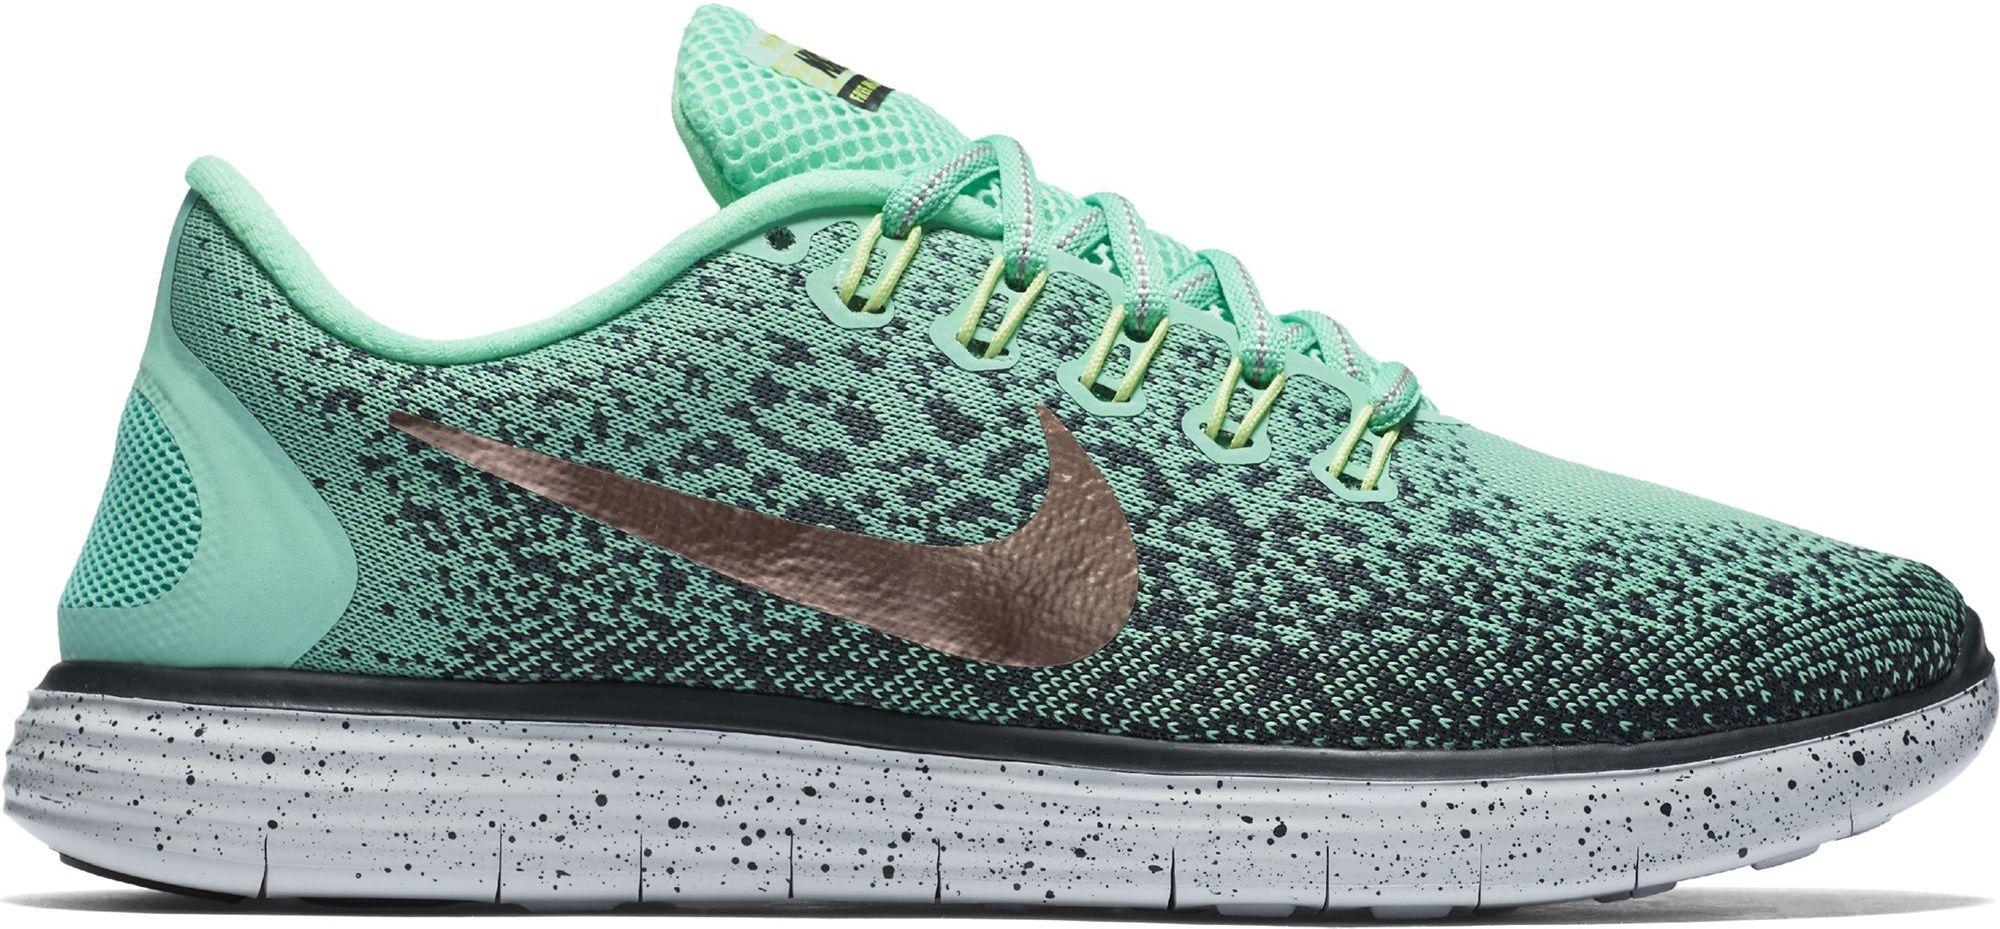 1c1d320b0684 ... Nike FREE RN DISTANCE SHIELD. Women s running shoes ...